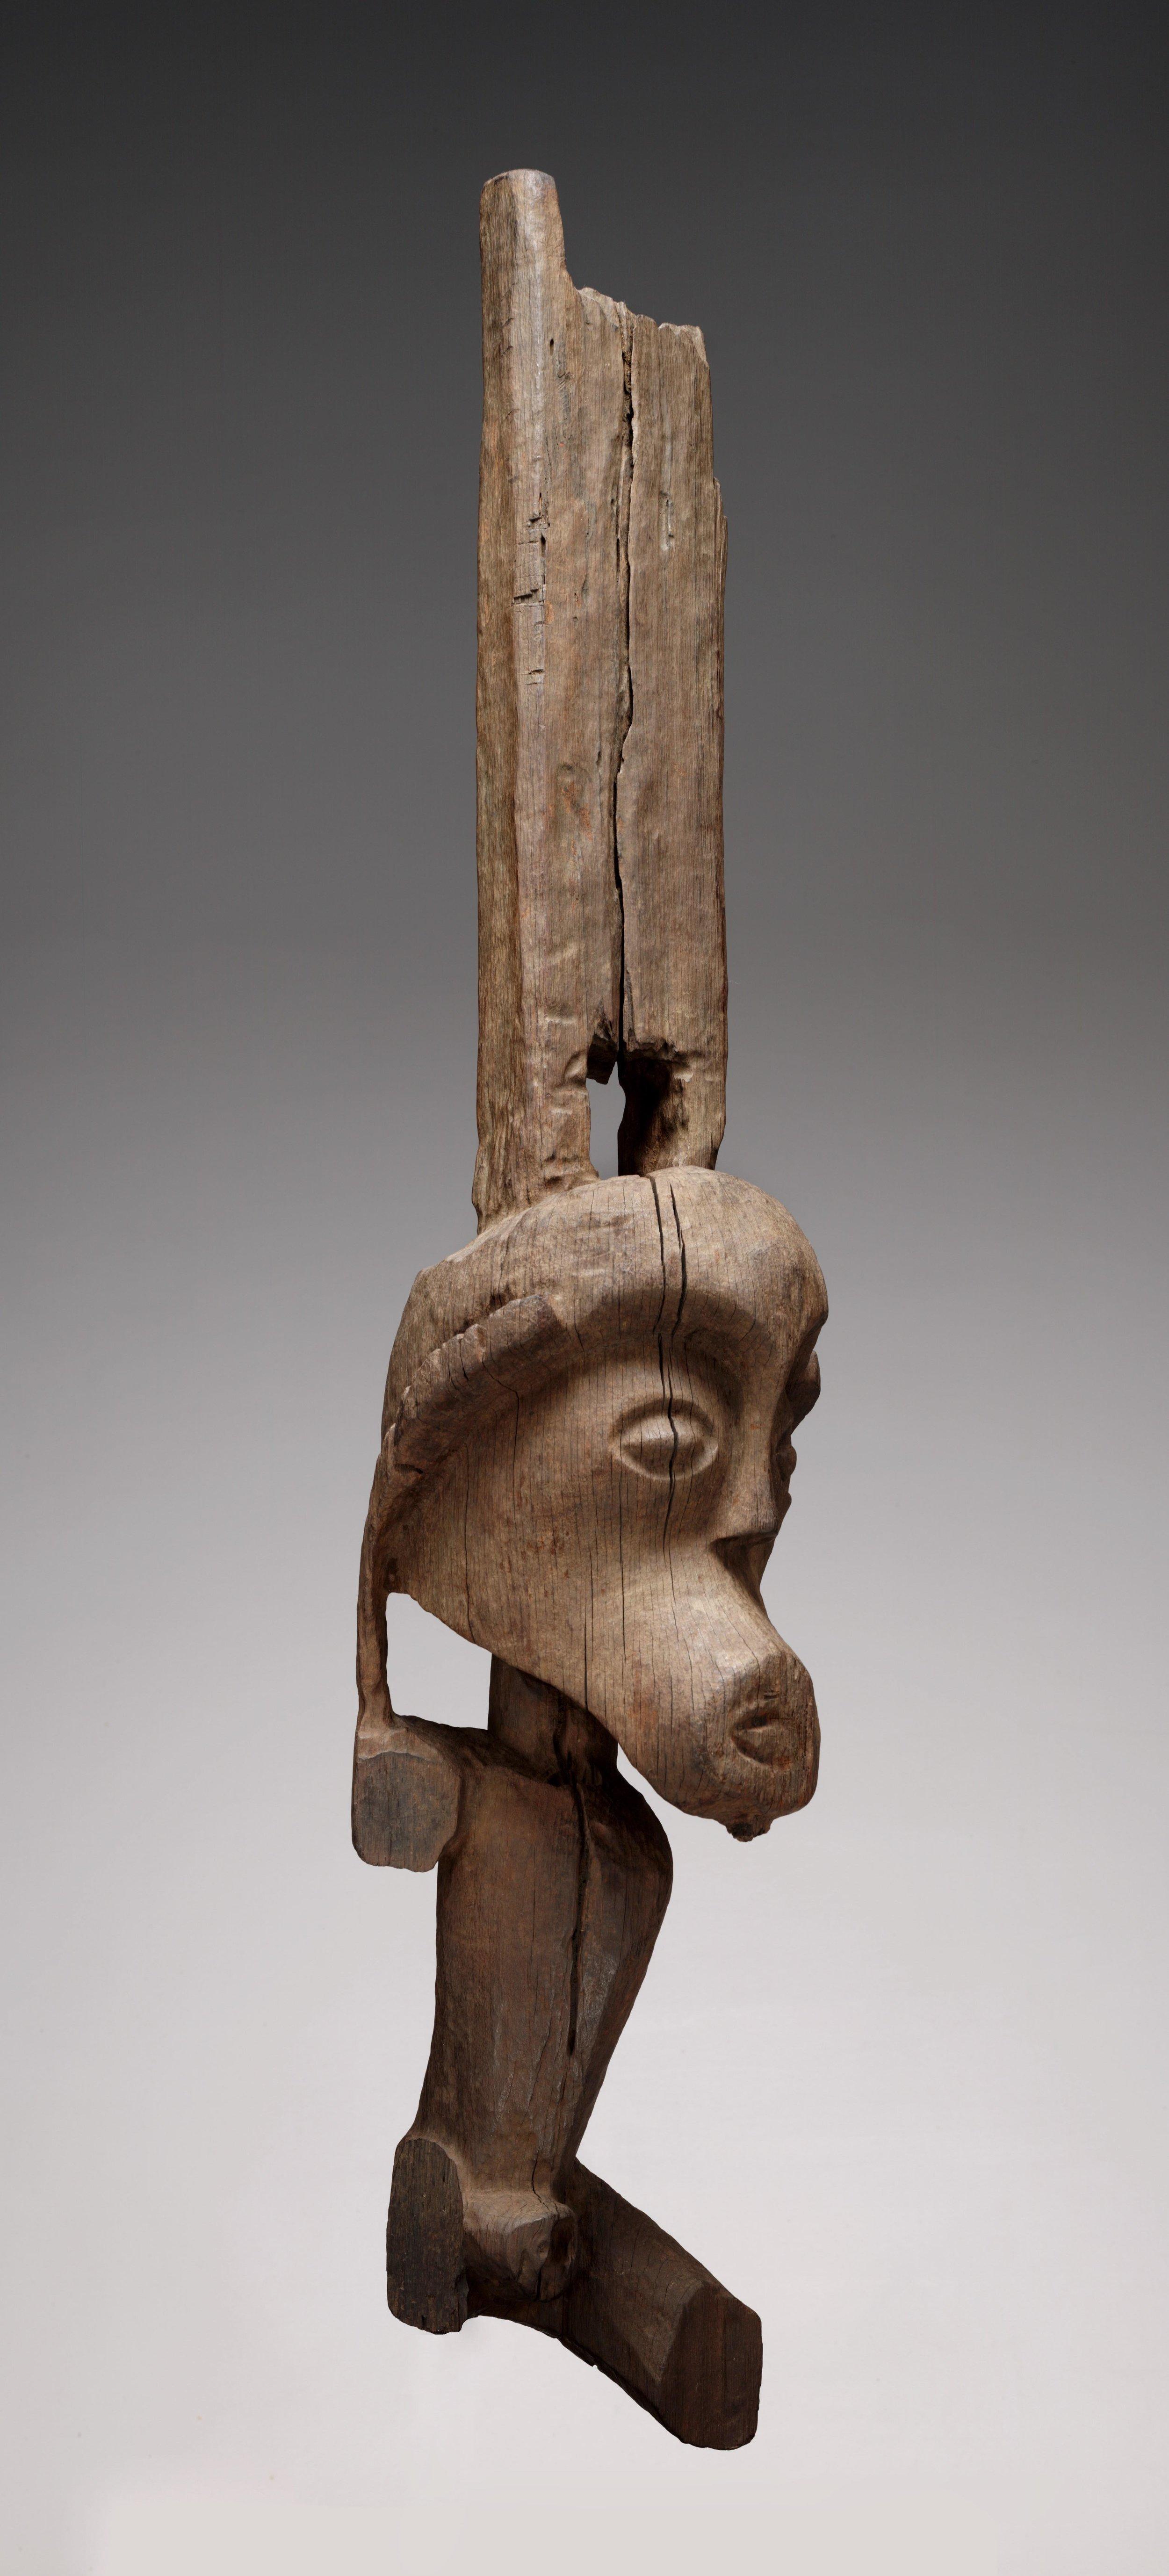 Tutelary Figure © The Dallas Museum of Art | Texas, USA